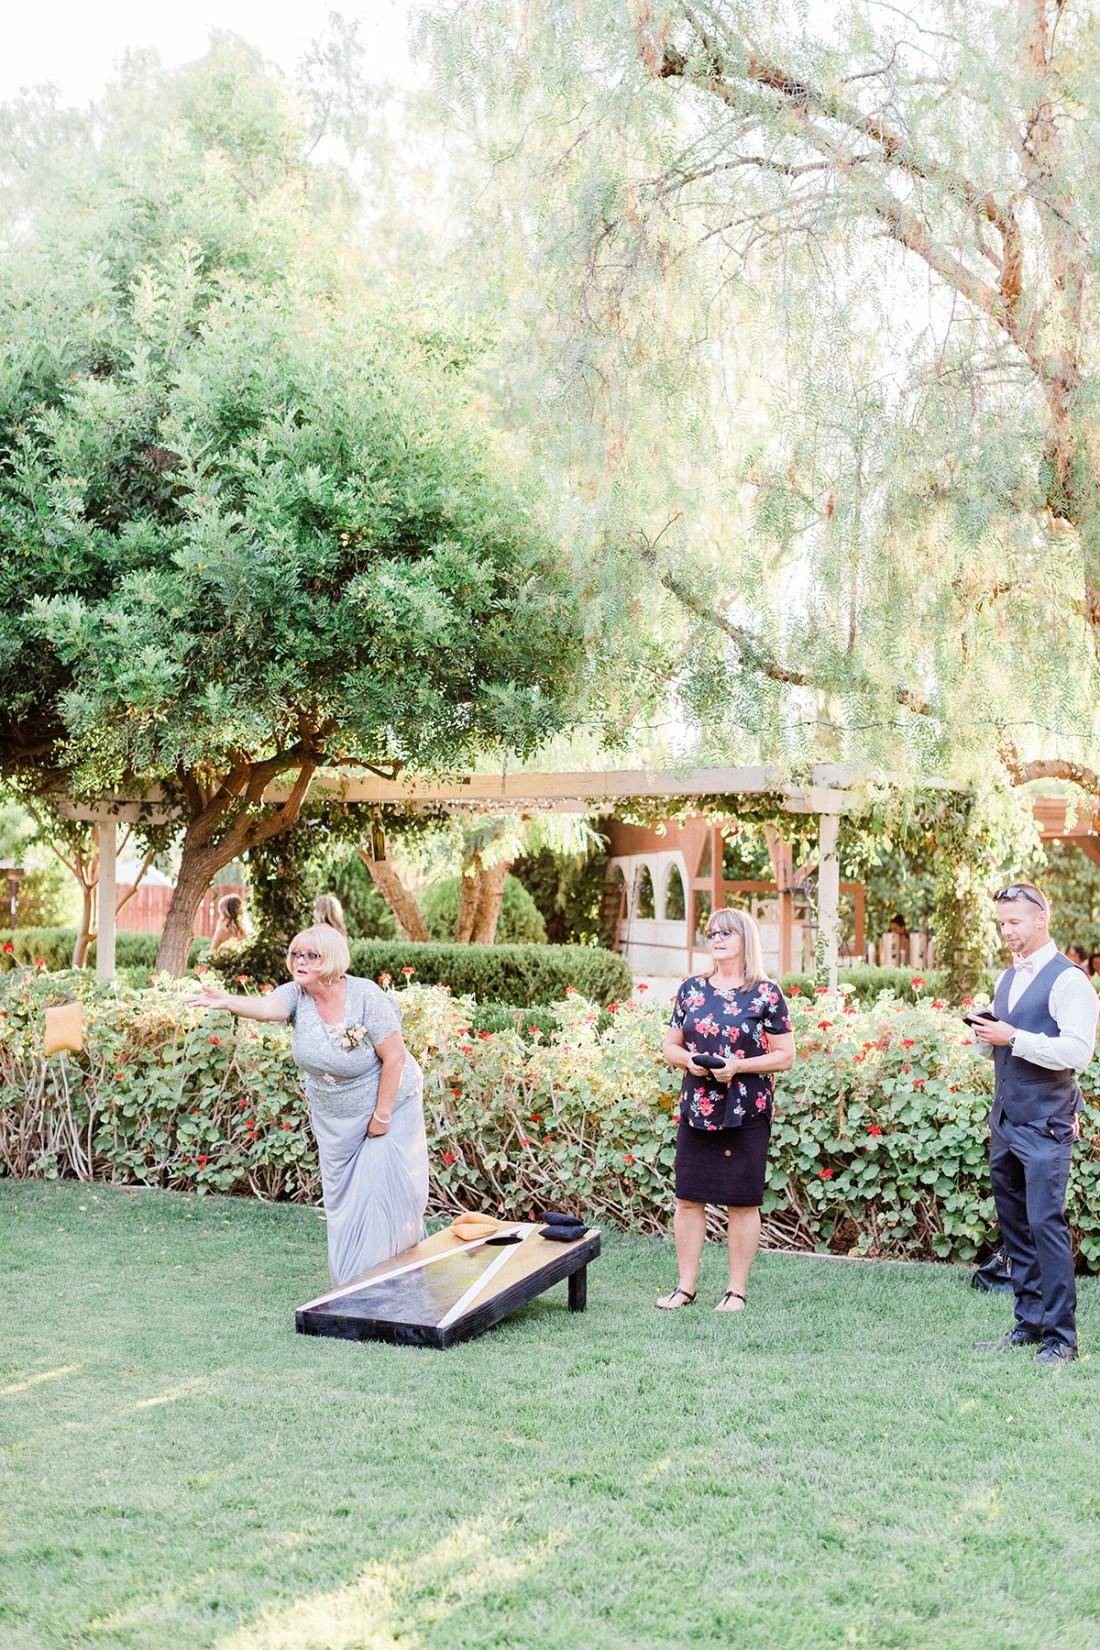 Custom Cornhole Lawn Games at Wedding | A Good Hue